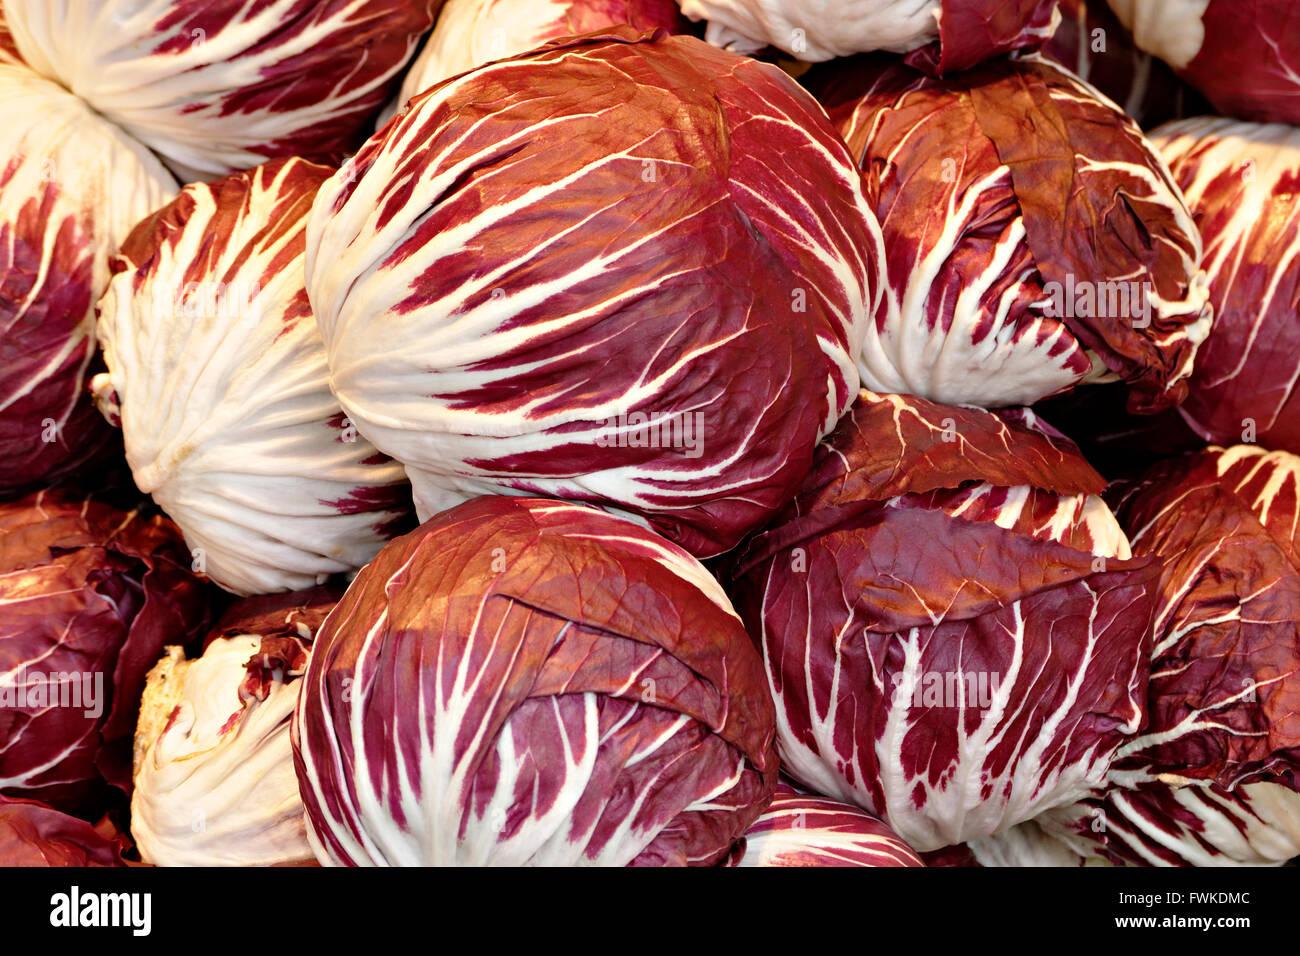 Cavoli rossi, Kraut rosso o blu Kraut (Brassica oleracea convar. var. capitata rubra) Immagini Stock